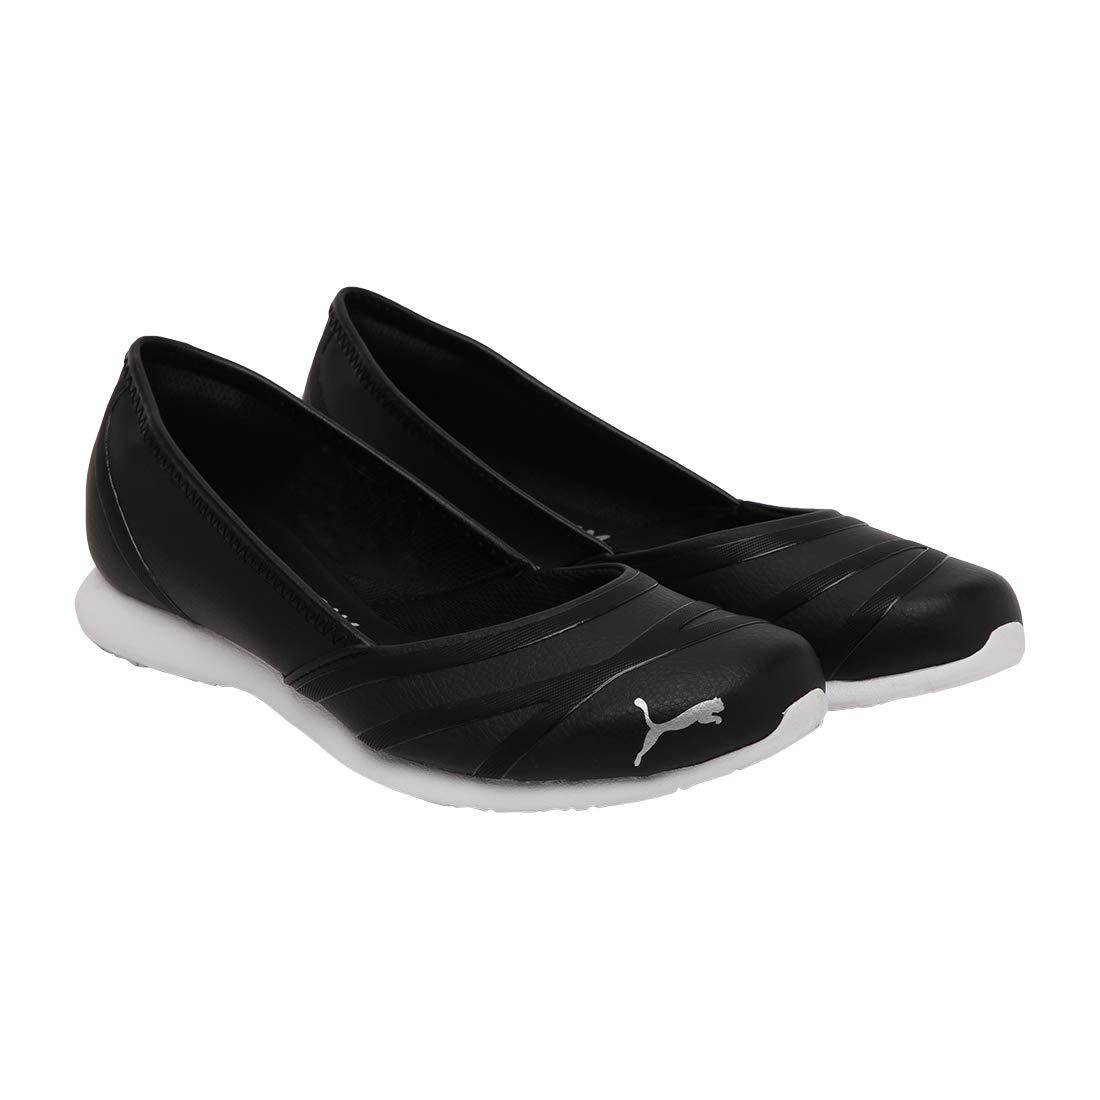 5af330dce2e13 Puma Women's Vega Sl Idp Ballet Flats